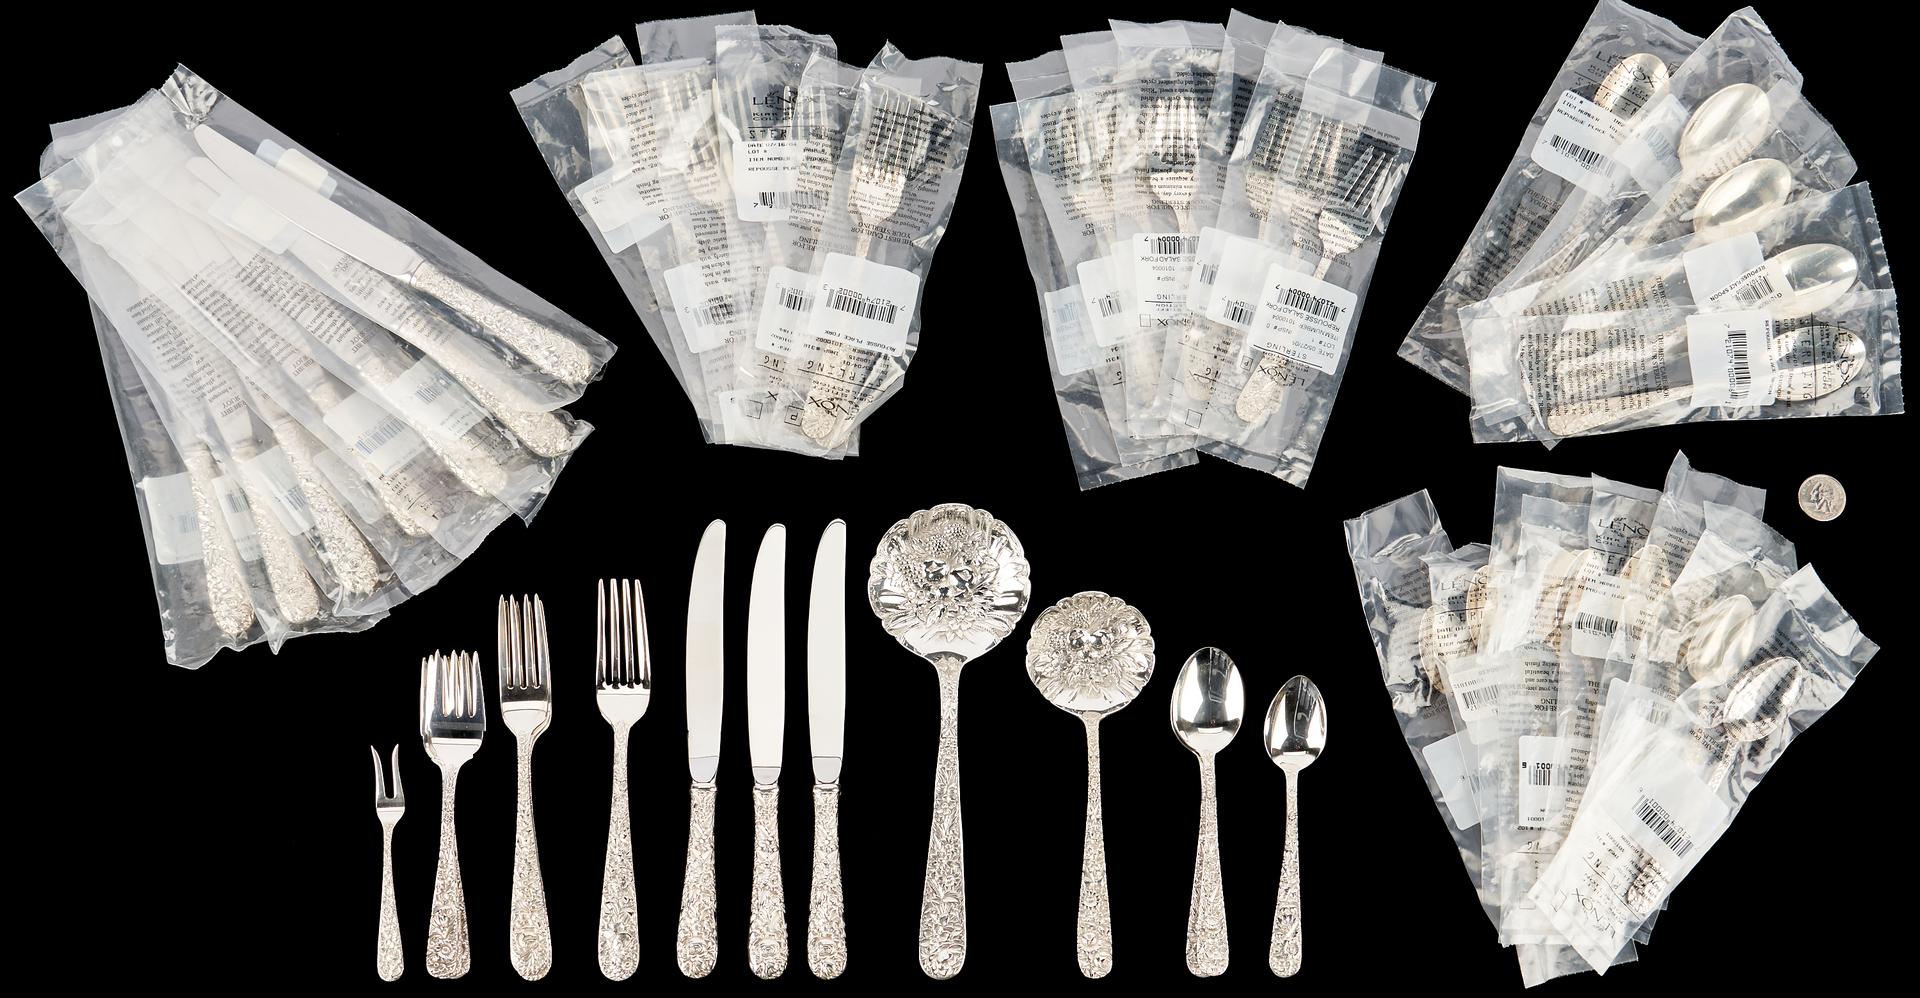 Lot 501: 50 Pcs. Kirk Repousse Sterling Silver Flatware